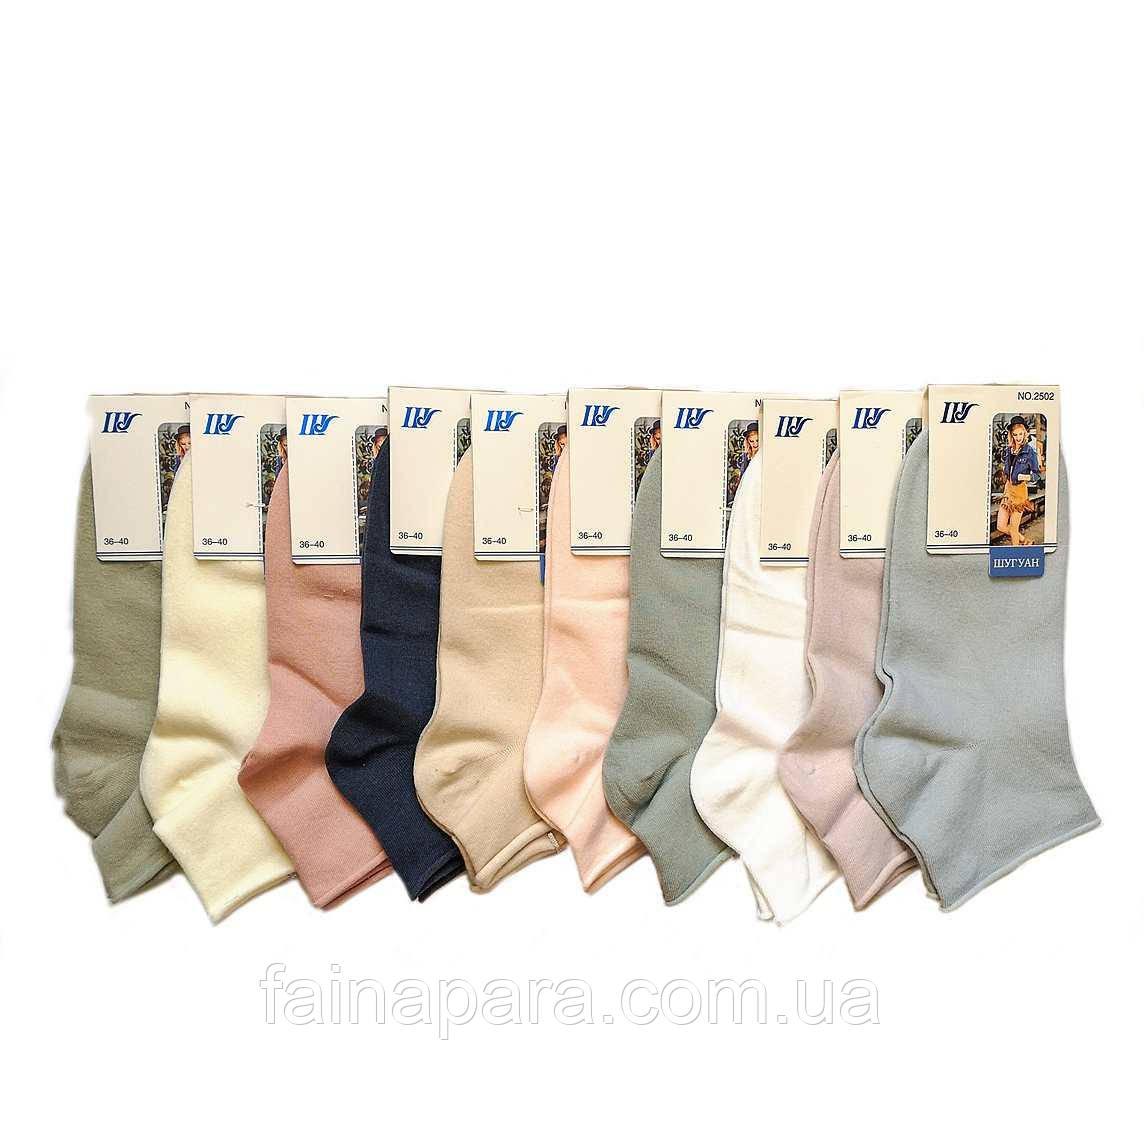 Короткие женские носки без резинки